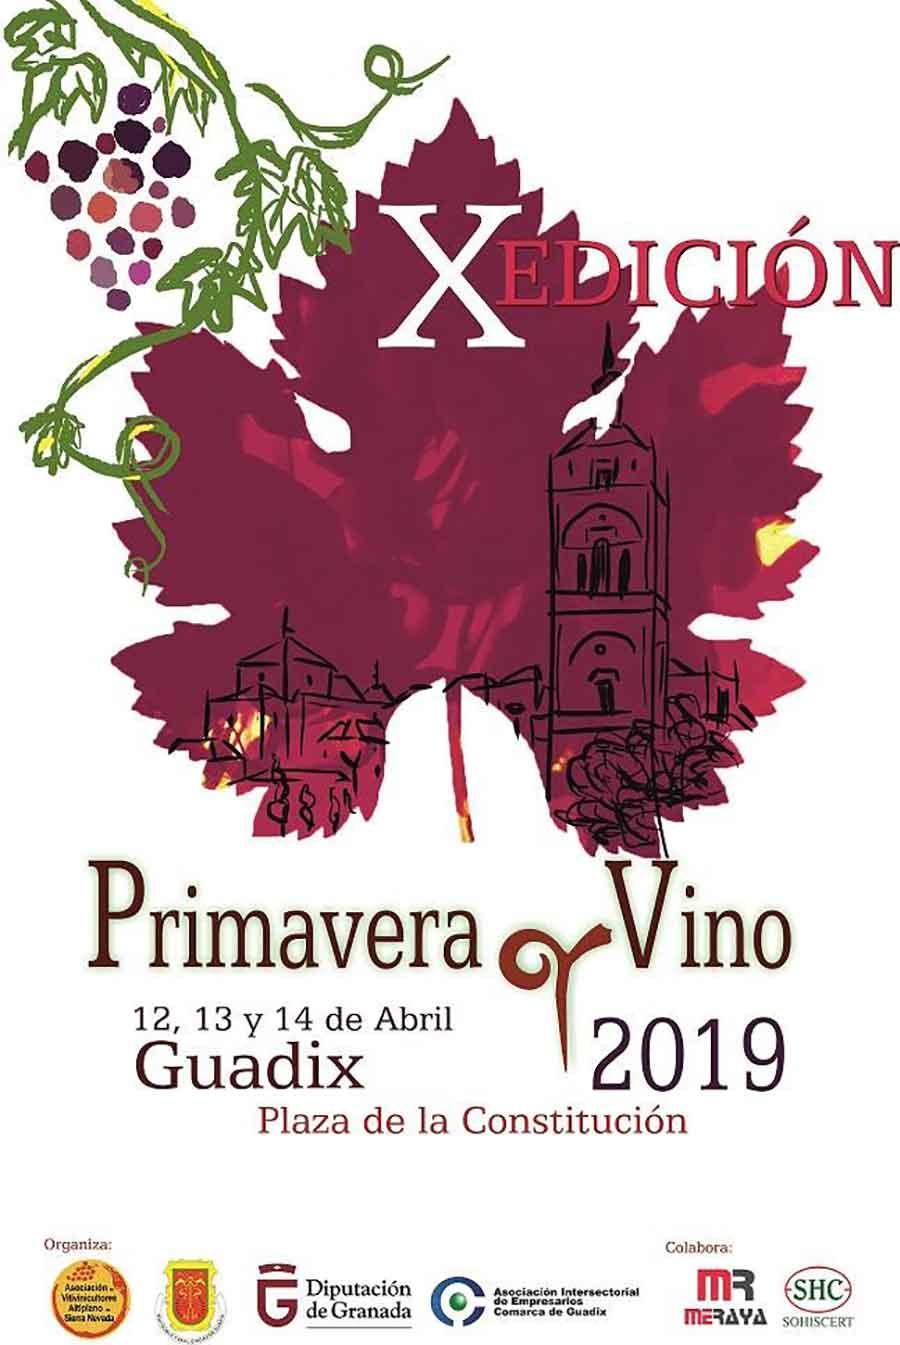 Primavera y vino Guadix 2019